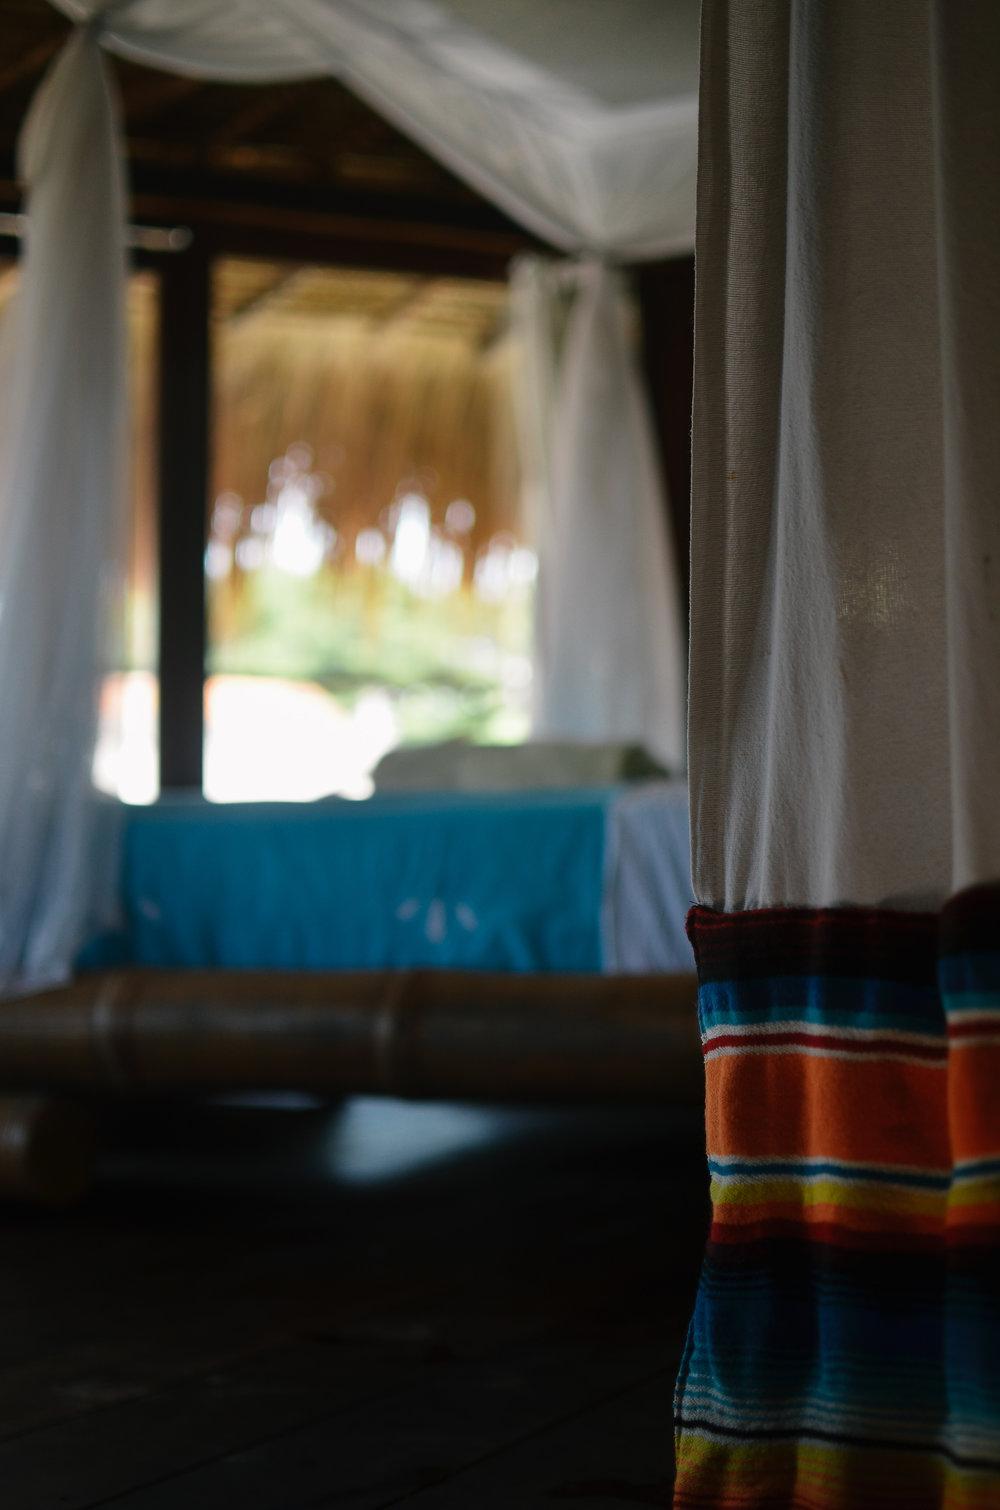 mu-villa-bali-boutique-hotel-lifeonpine_DSC_2263.jpg